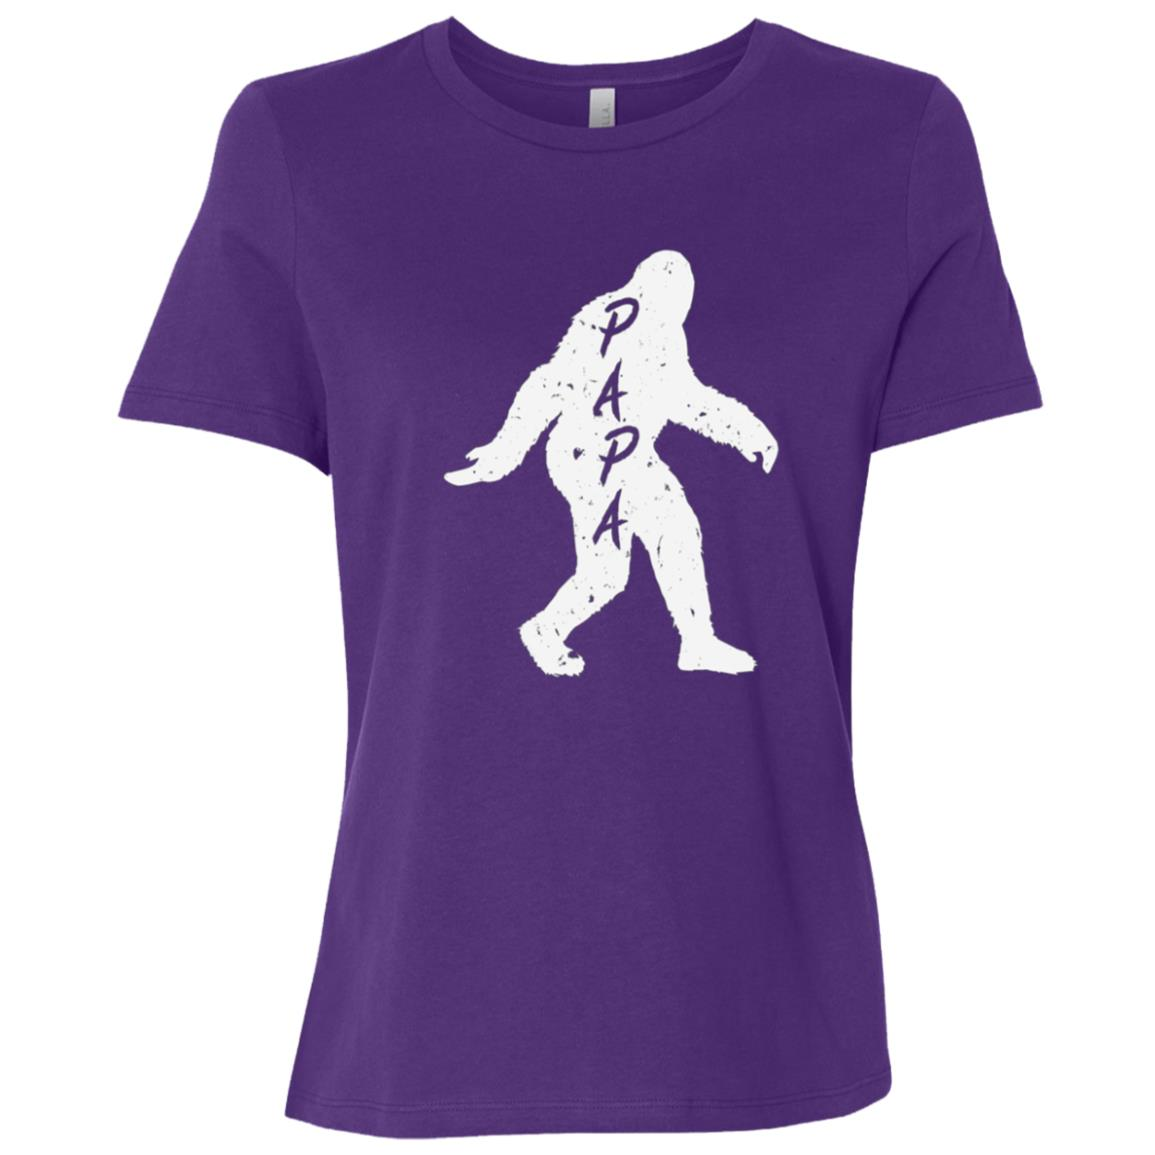 Papa Bigfoot Sasquatch Yeti Fathers Day Gift Tee Women Short Sleeve T-Shirt